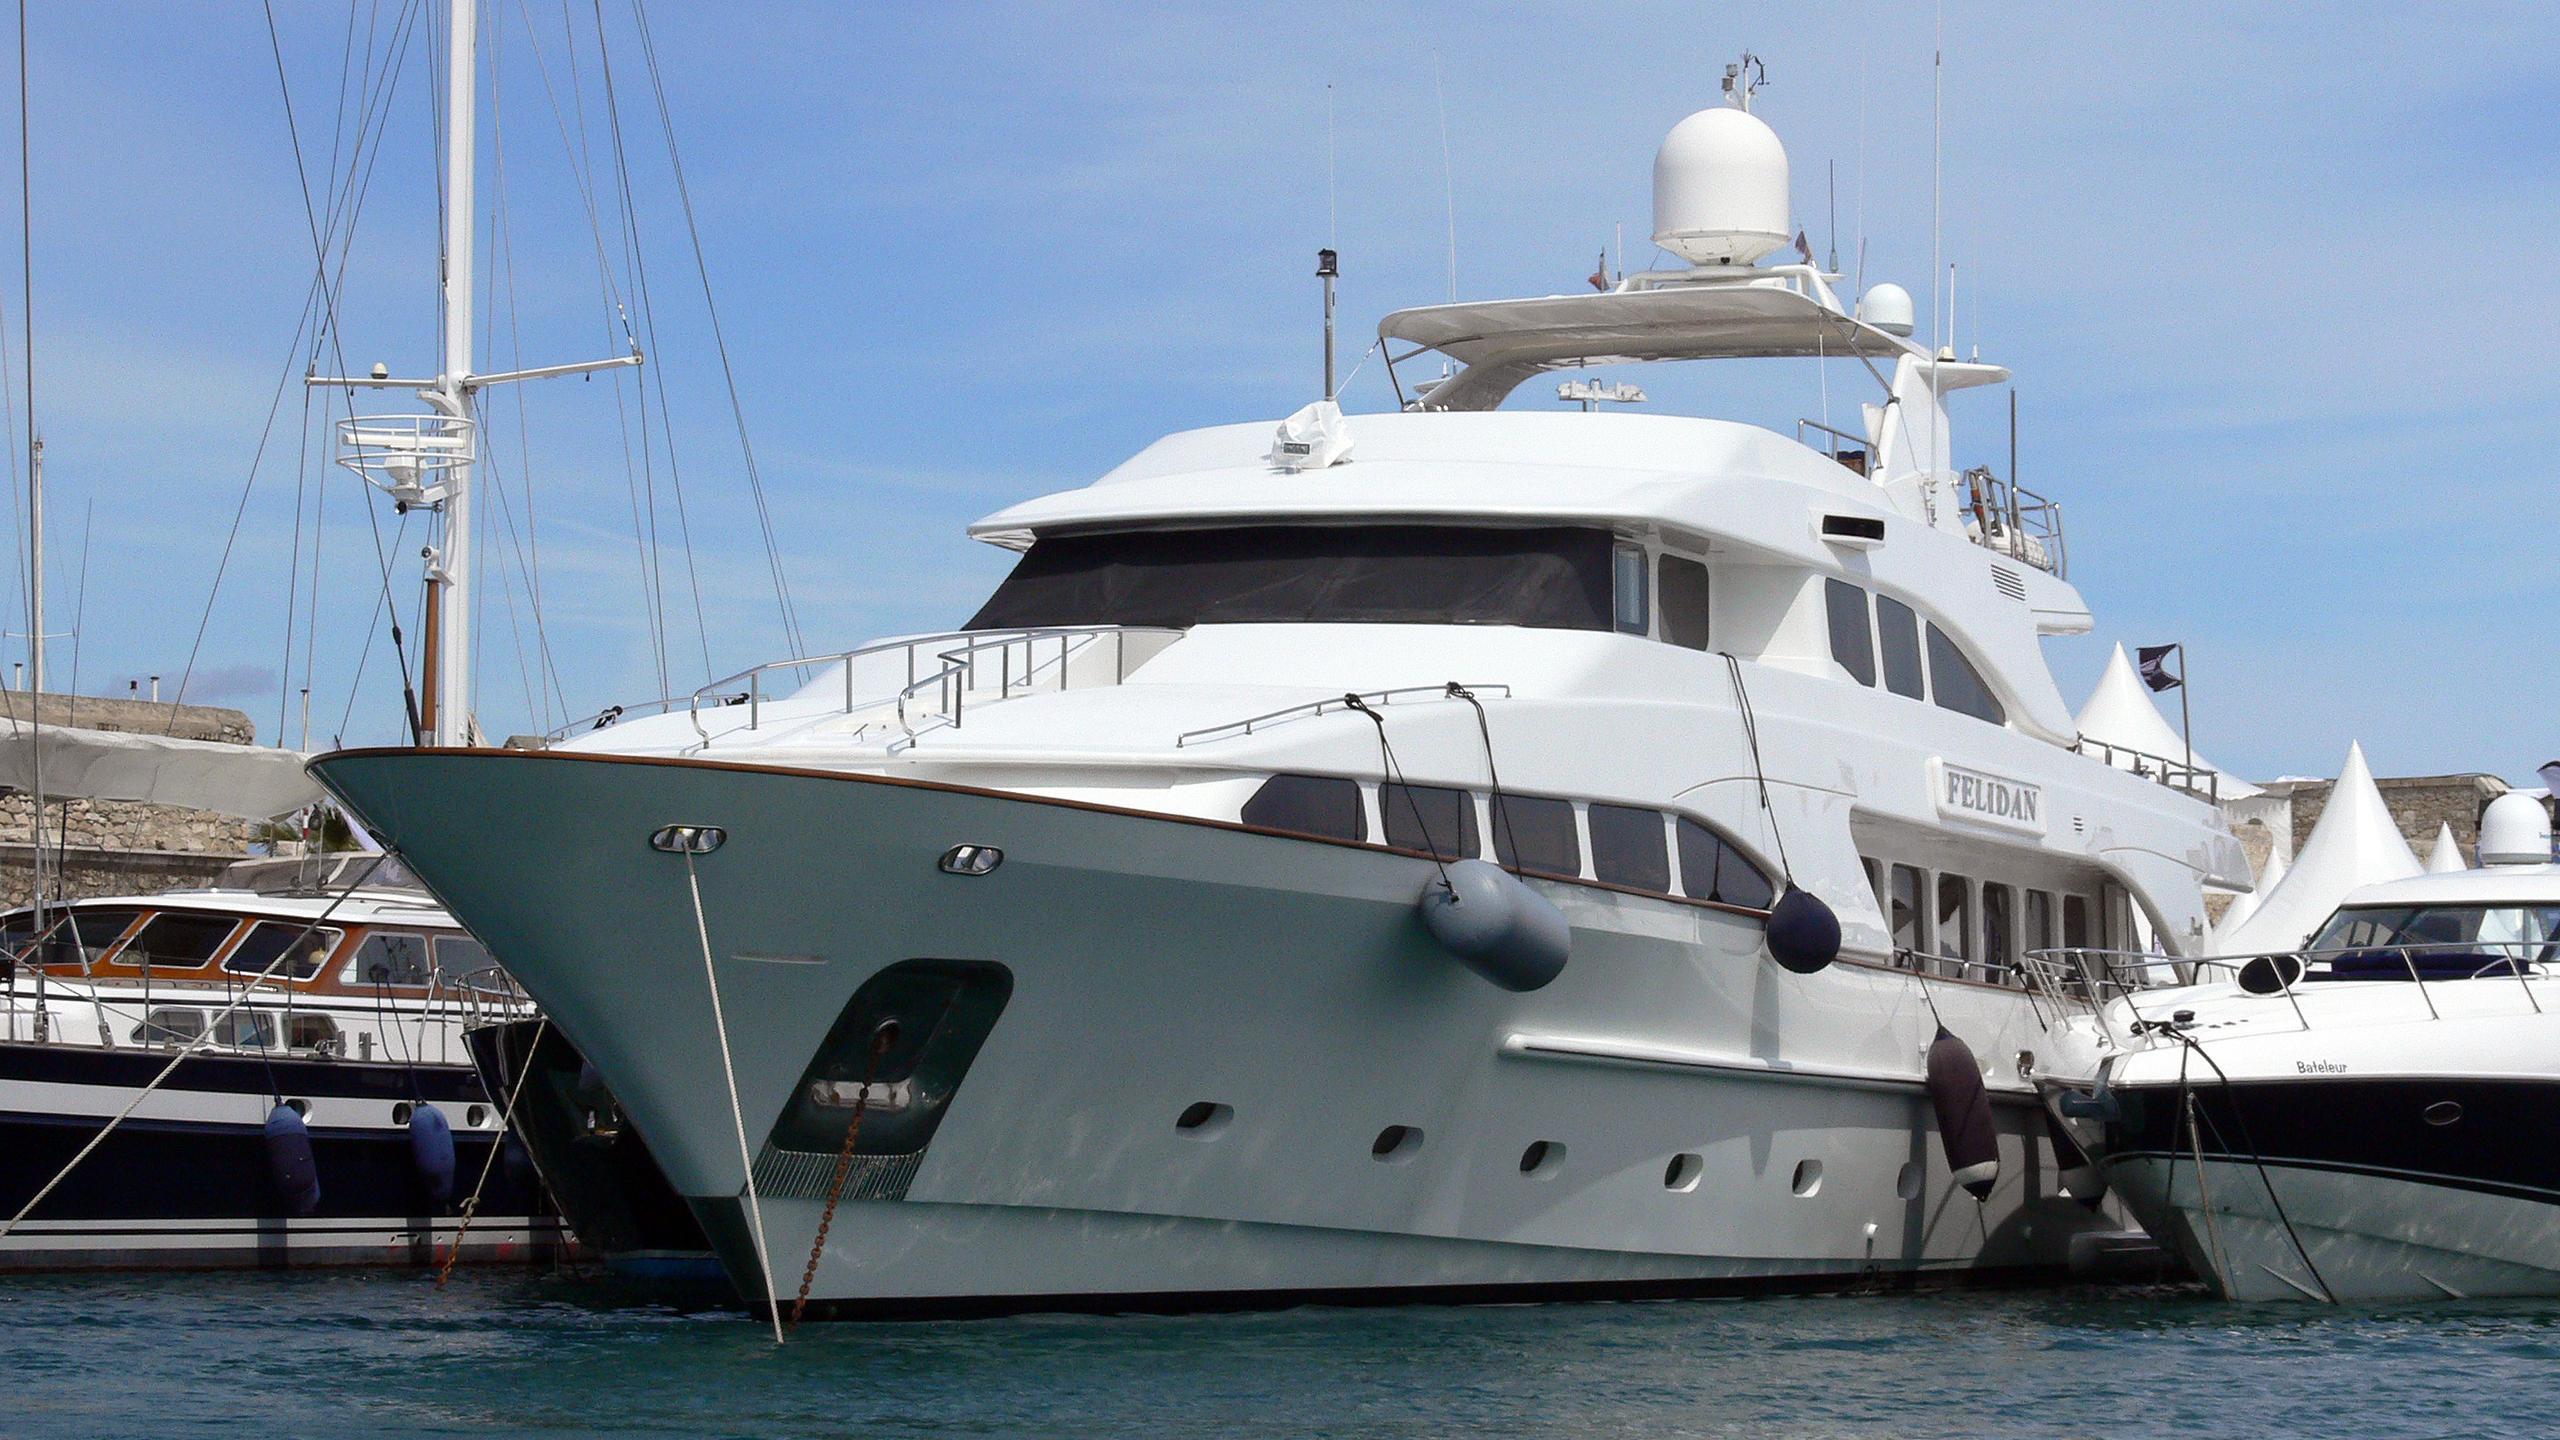 gallus-motor-yacht-benetti-classic-115-1999-35m-moored-stern